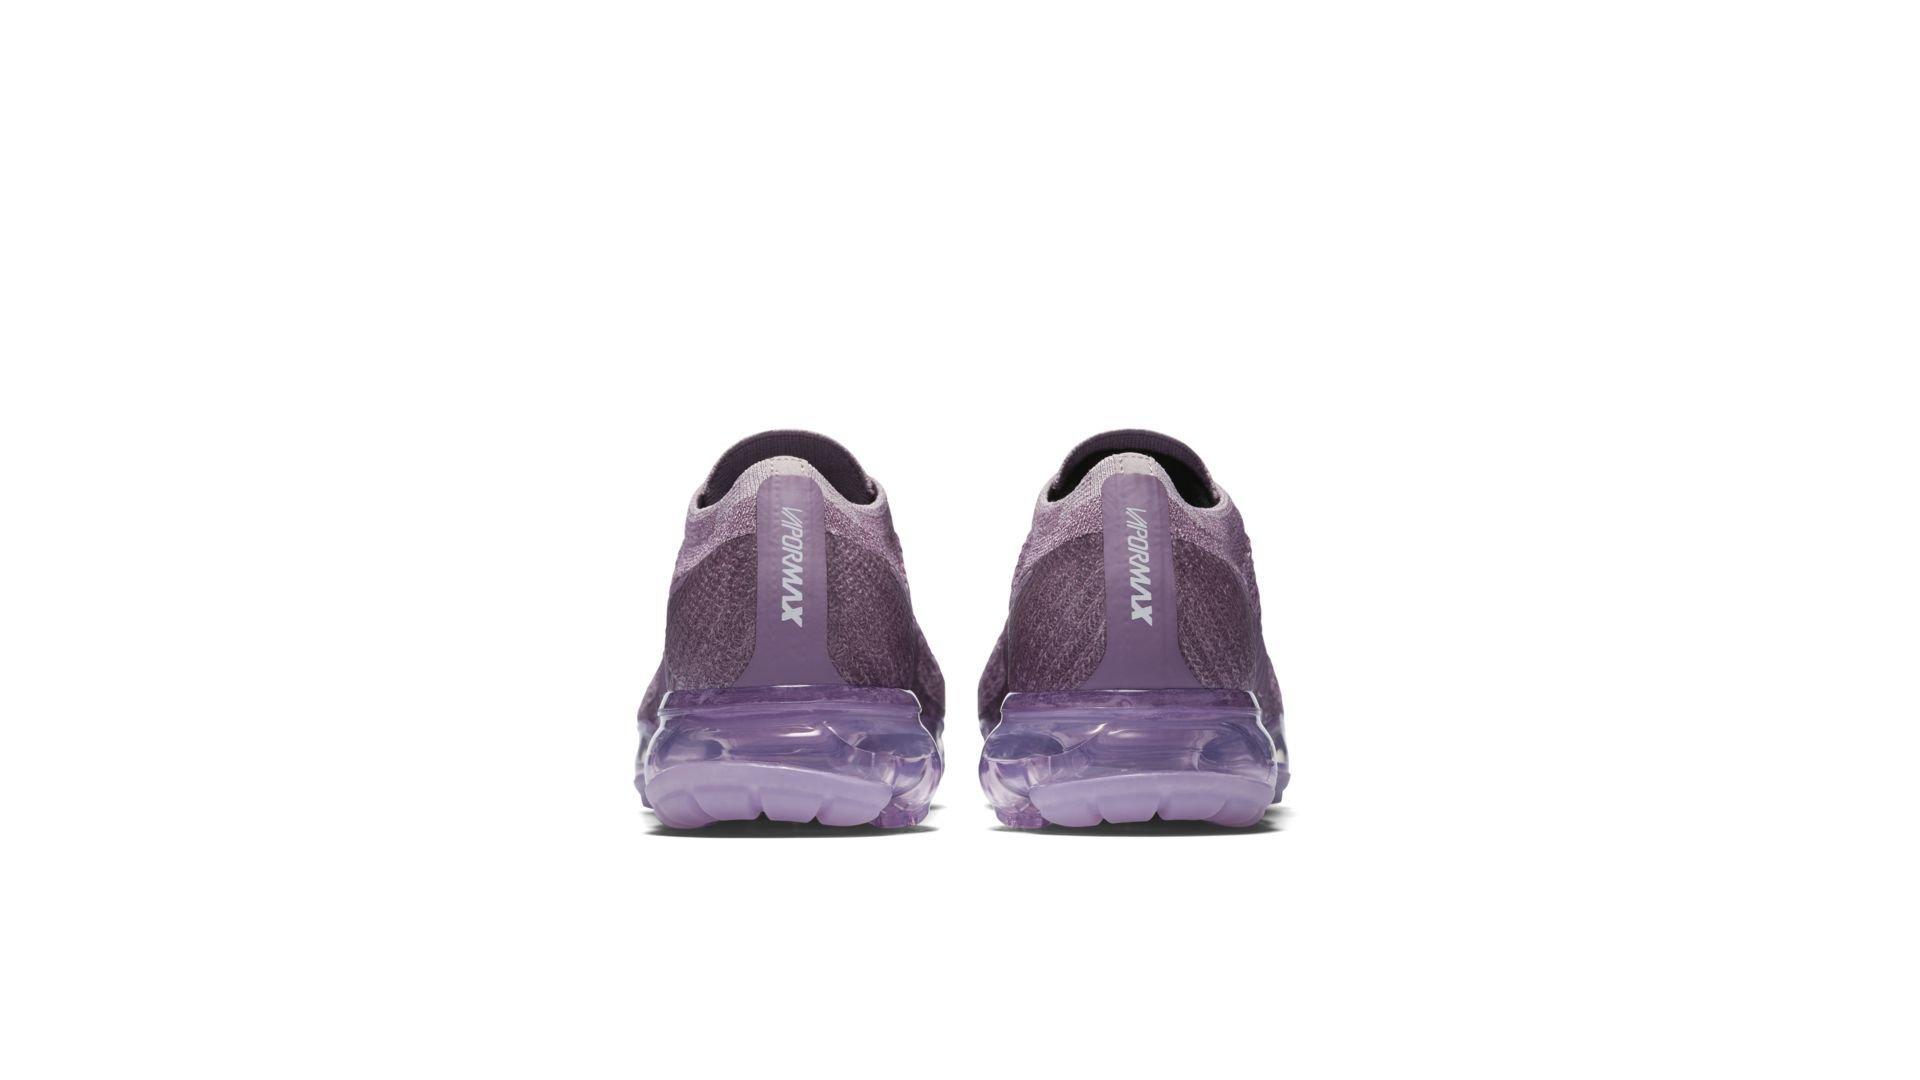 Nike Air Vapormax Violet Dust W (849557-500)